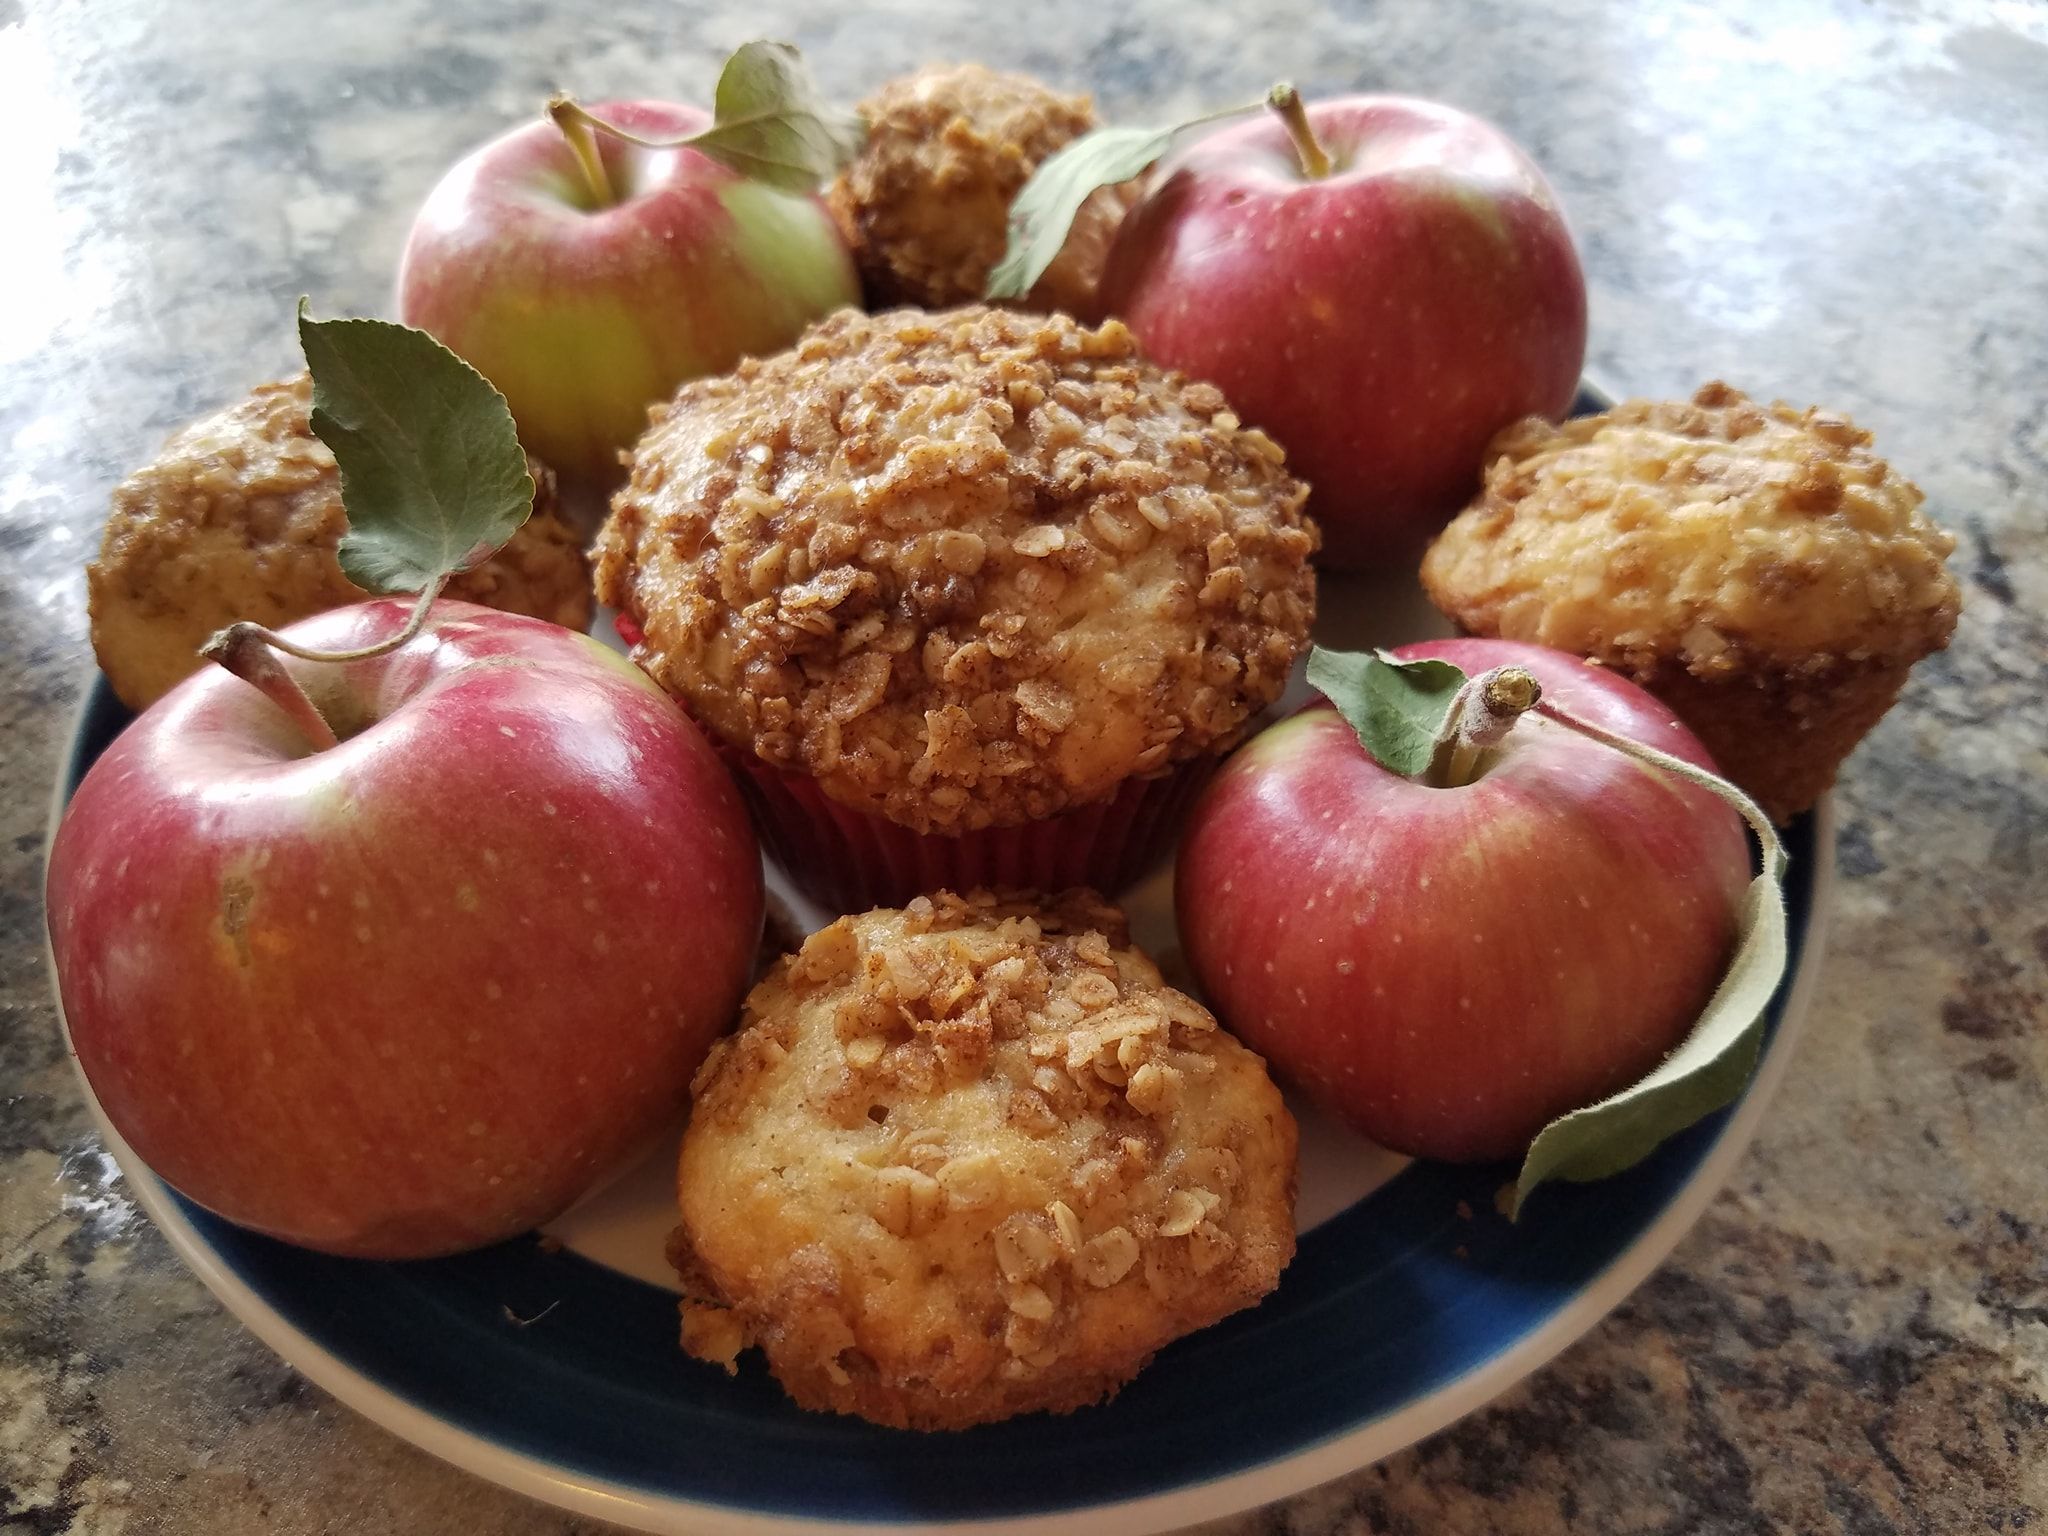 Amanda's Apple Cinnamon Oatmeal Muffins